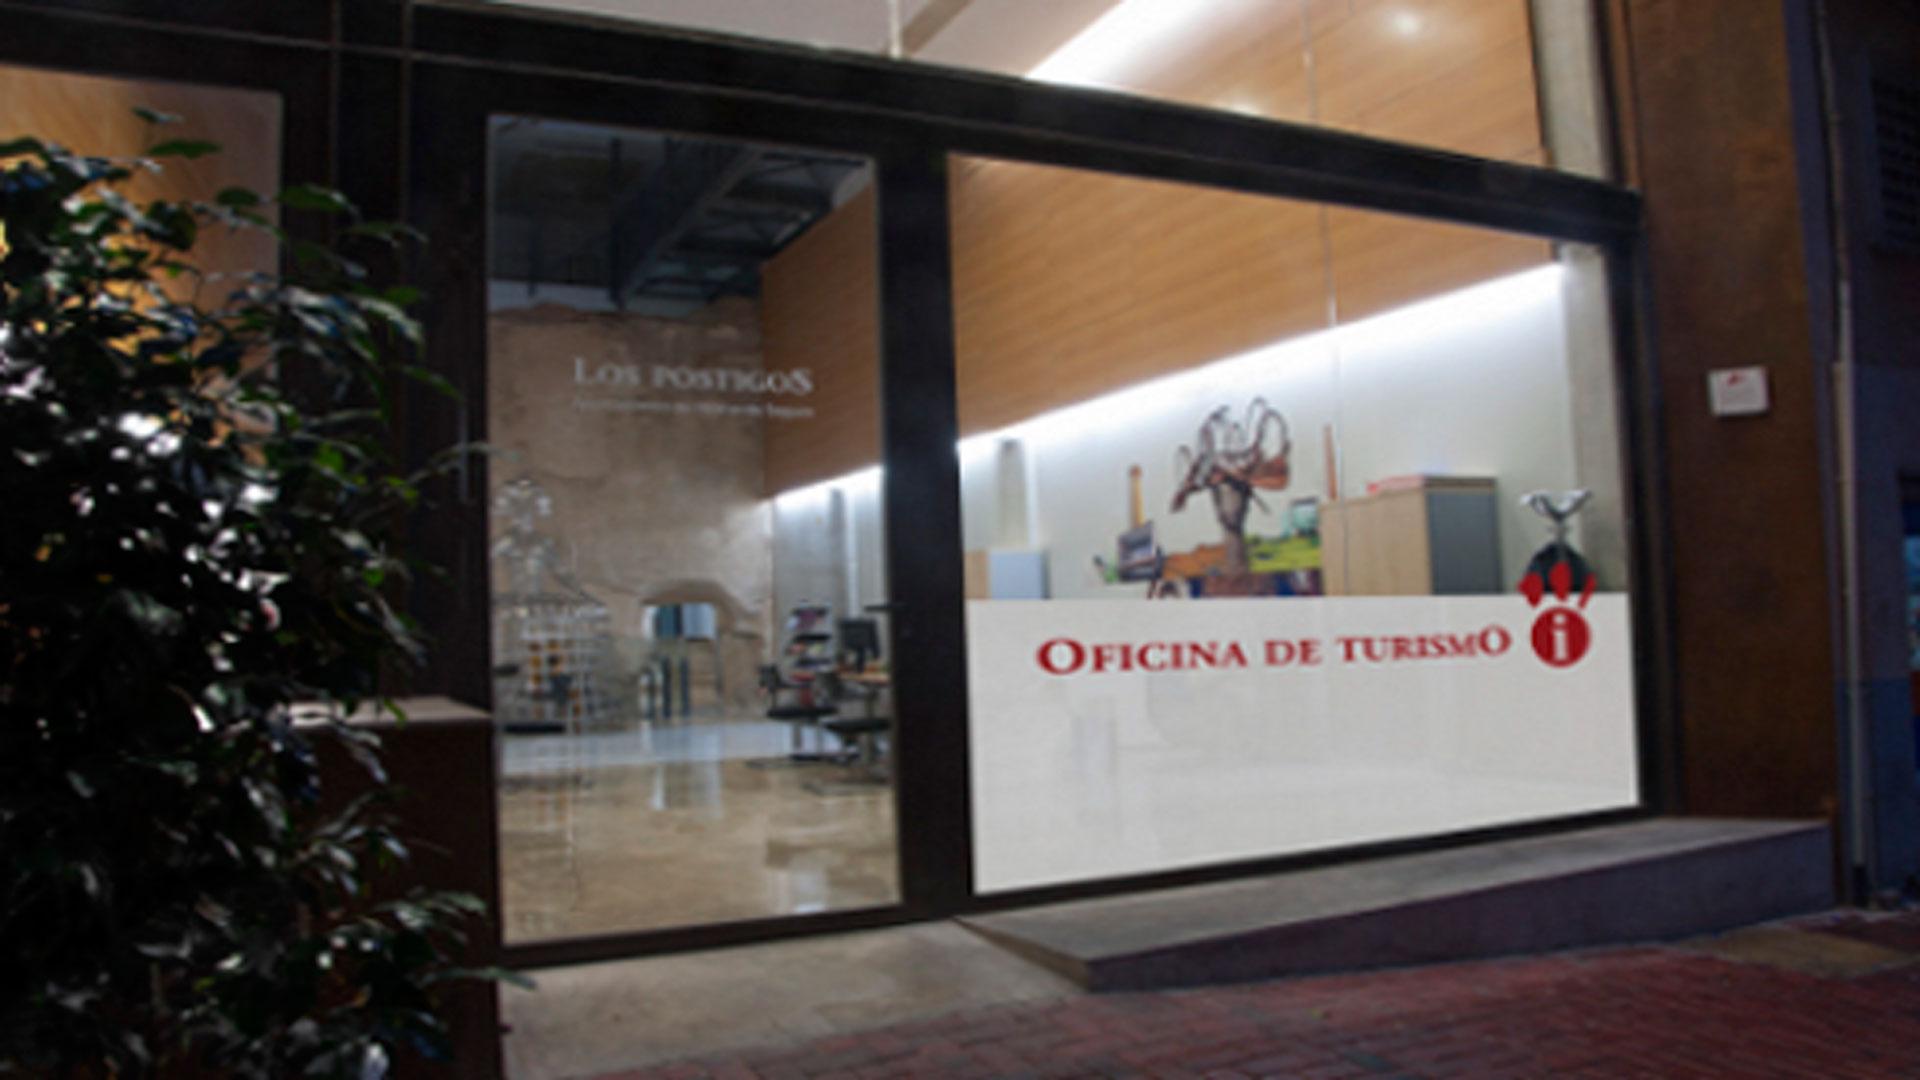 La oficina de turismo de molina de segura cinco soles rural for Oficina de turismo benasque